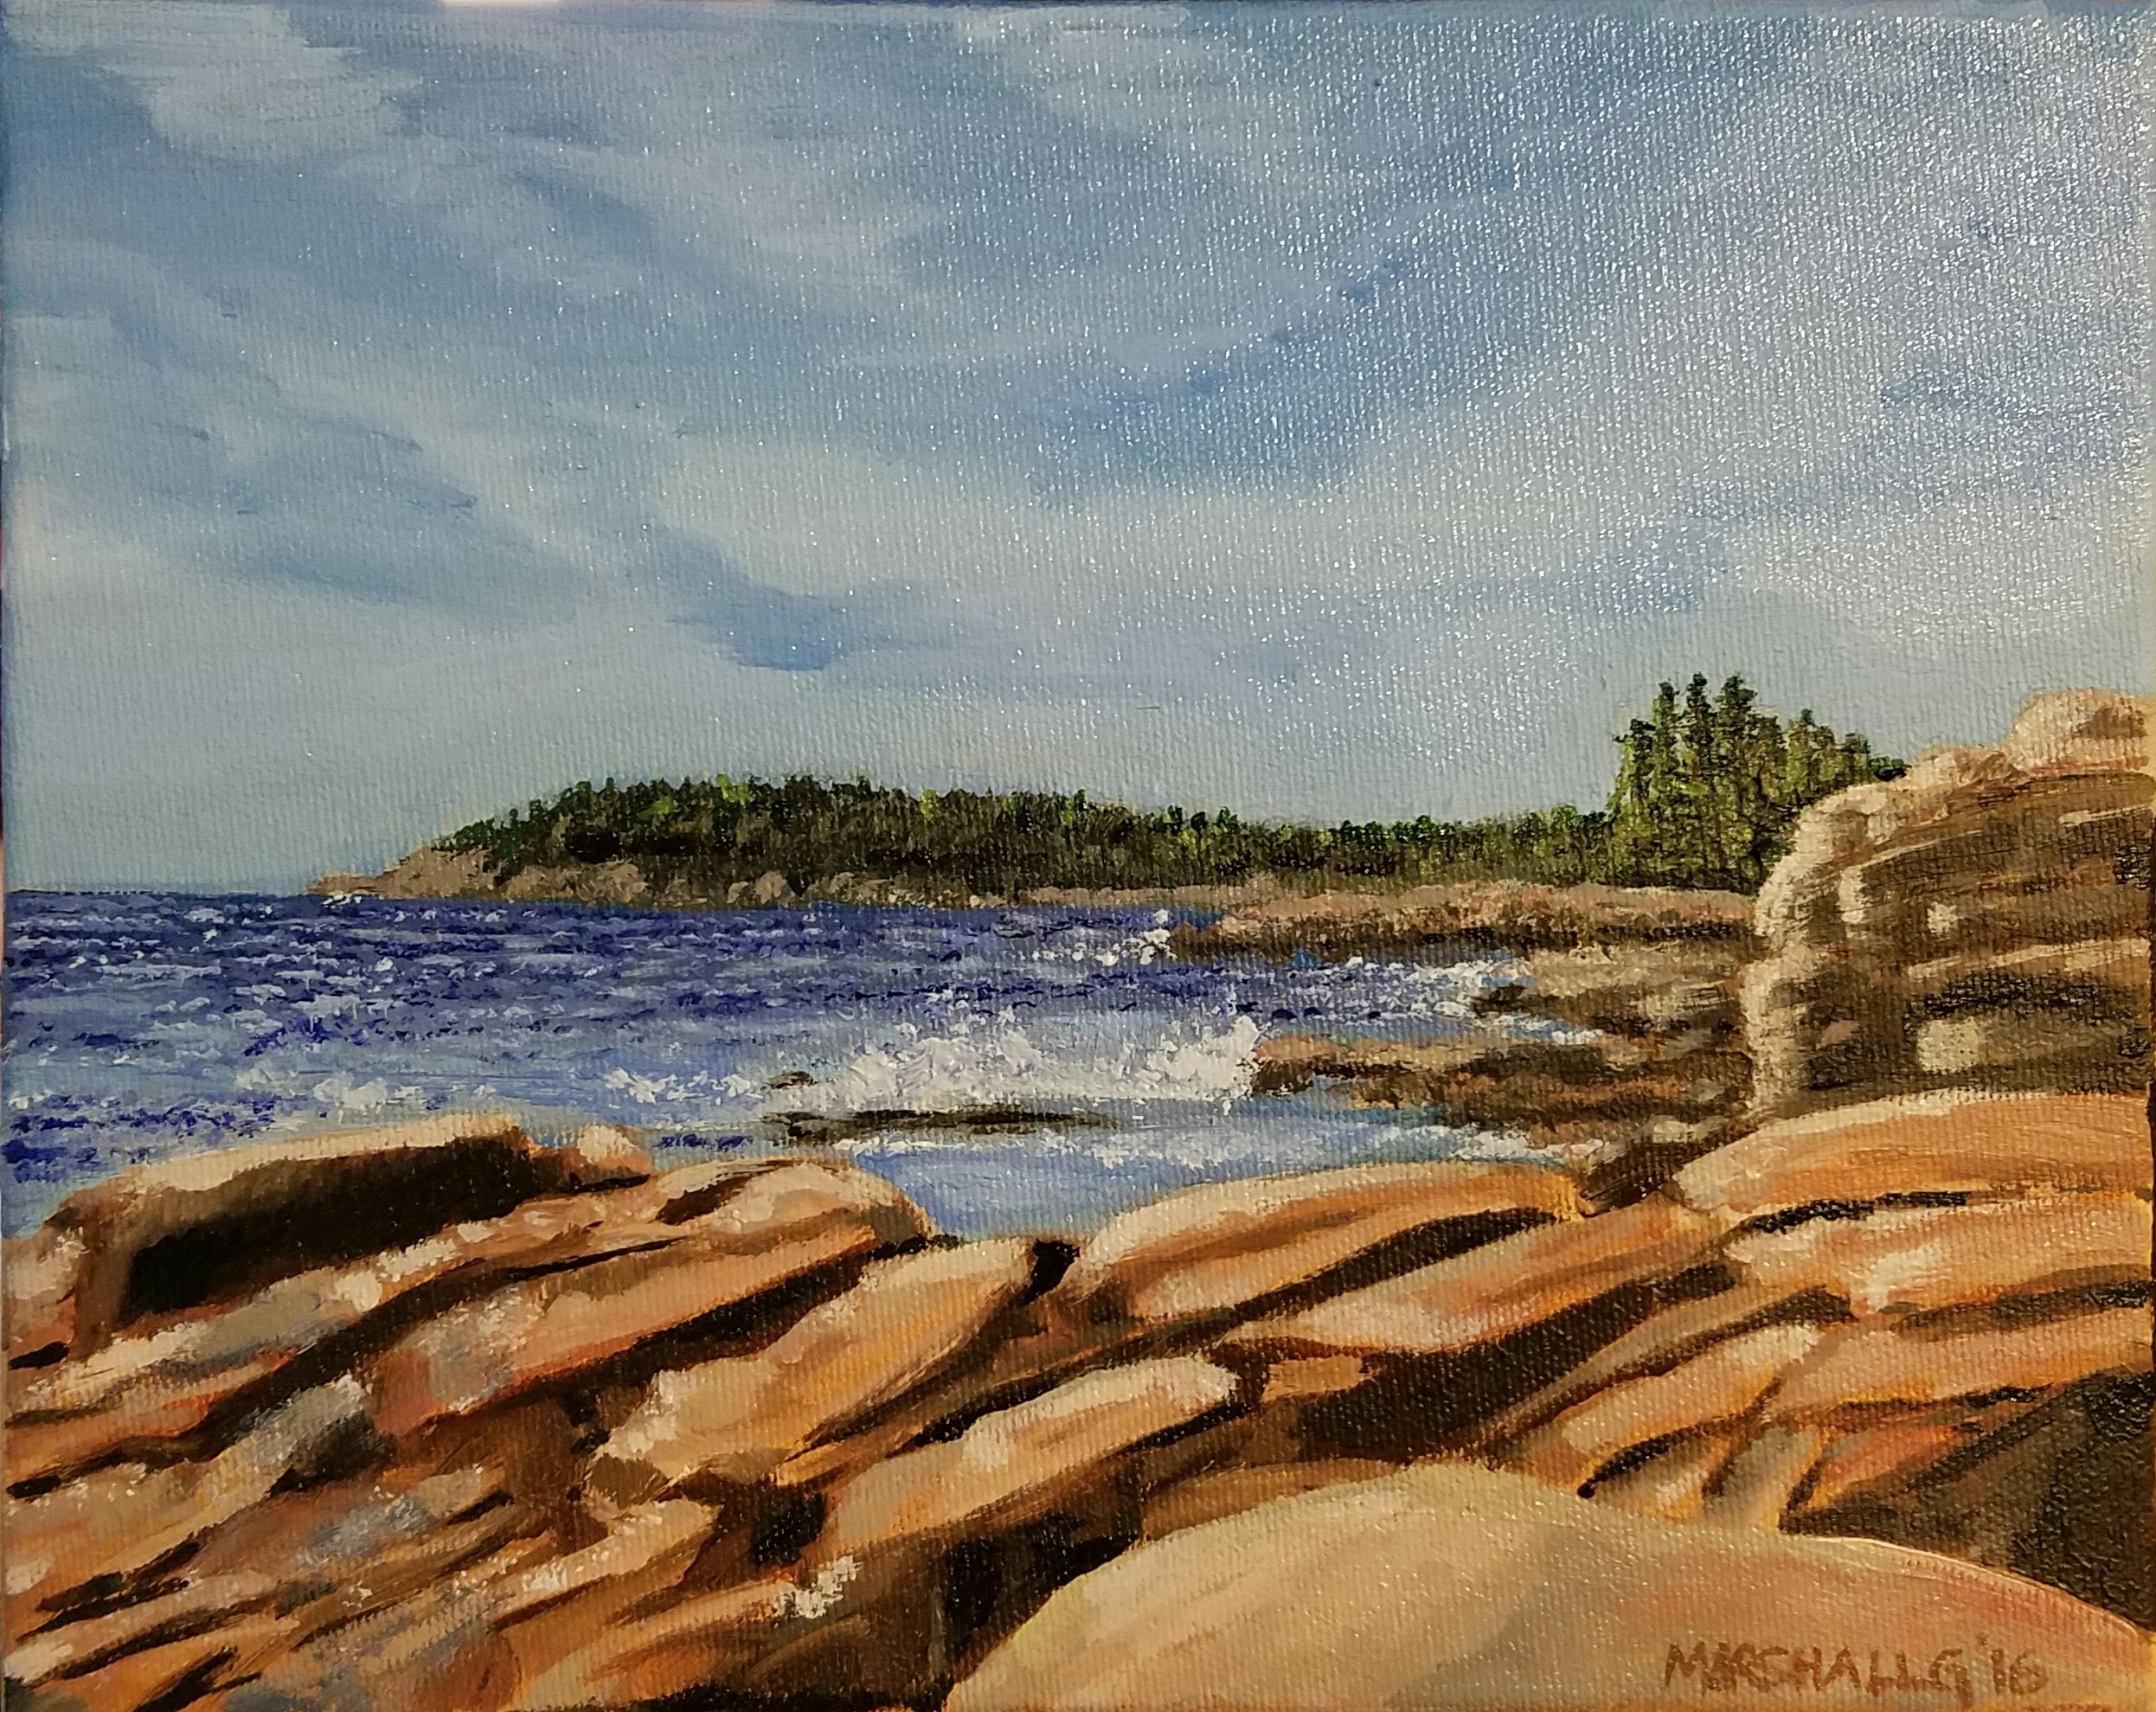 Otter Point on the Acadia Coast - SOLD